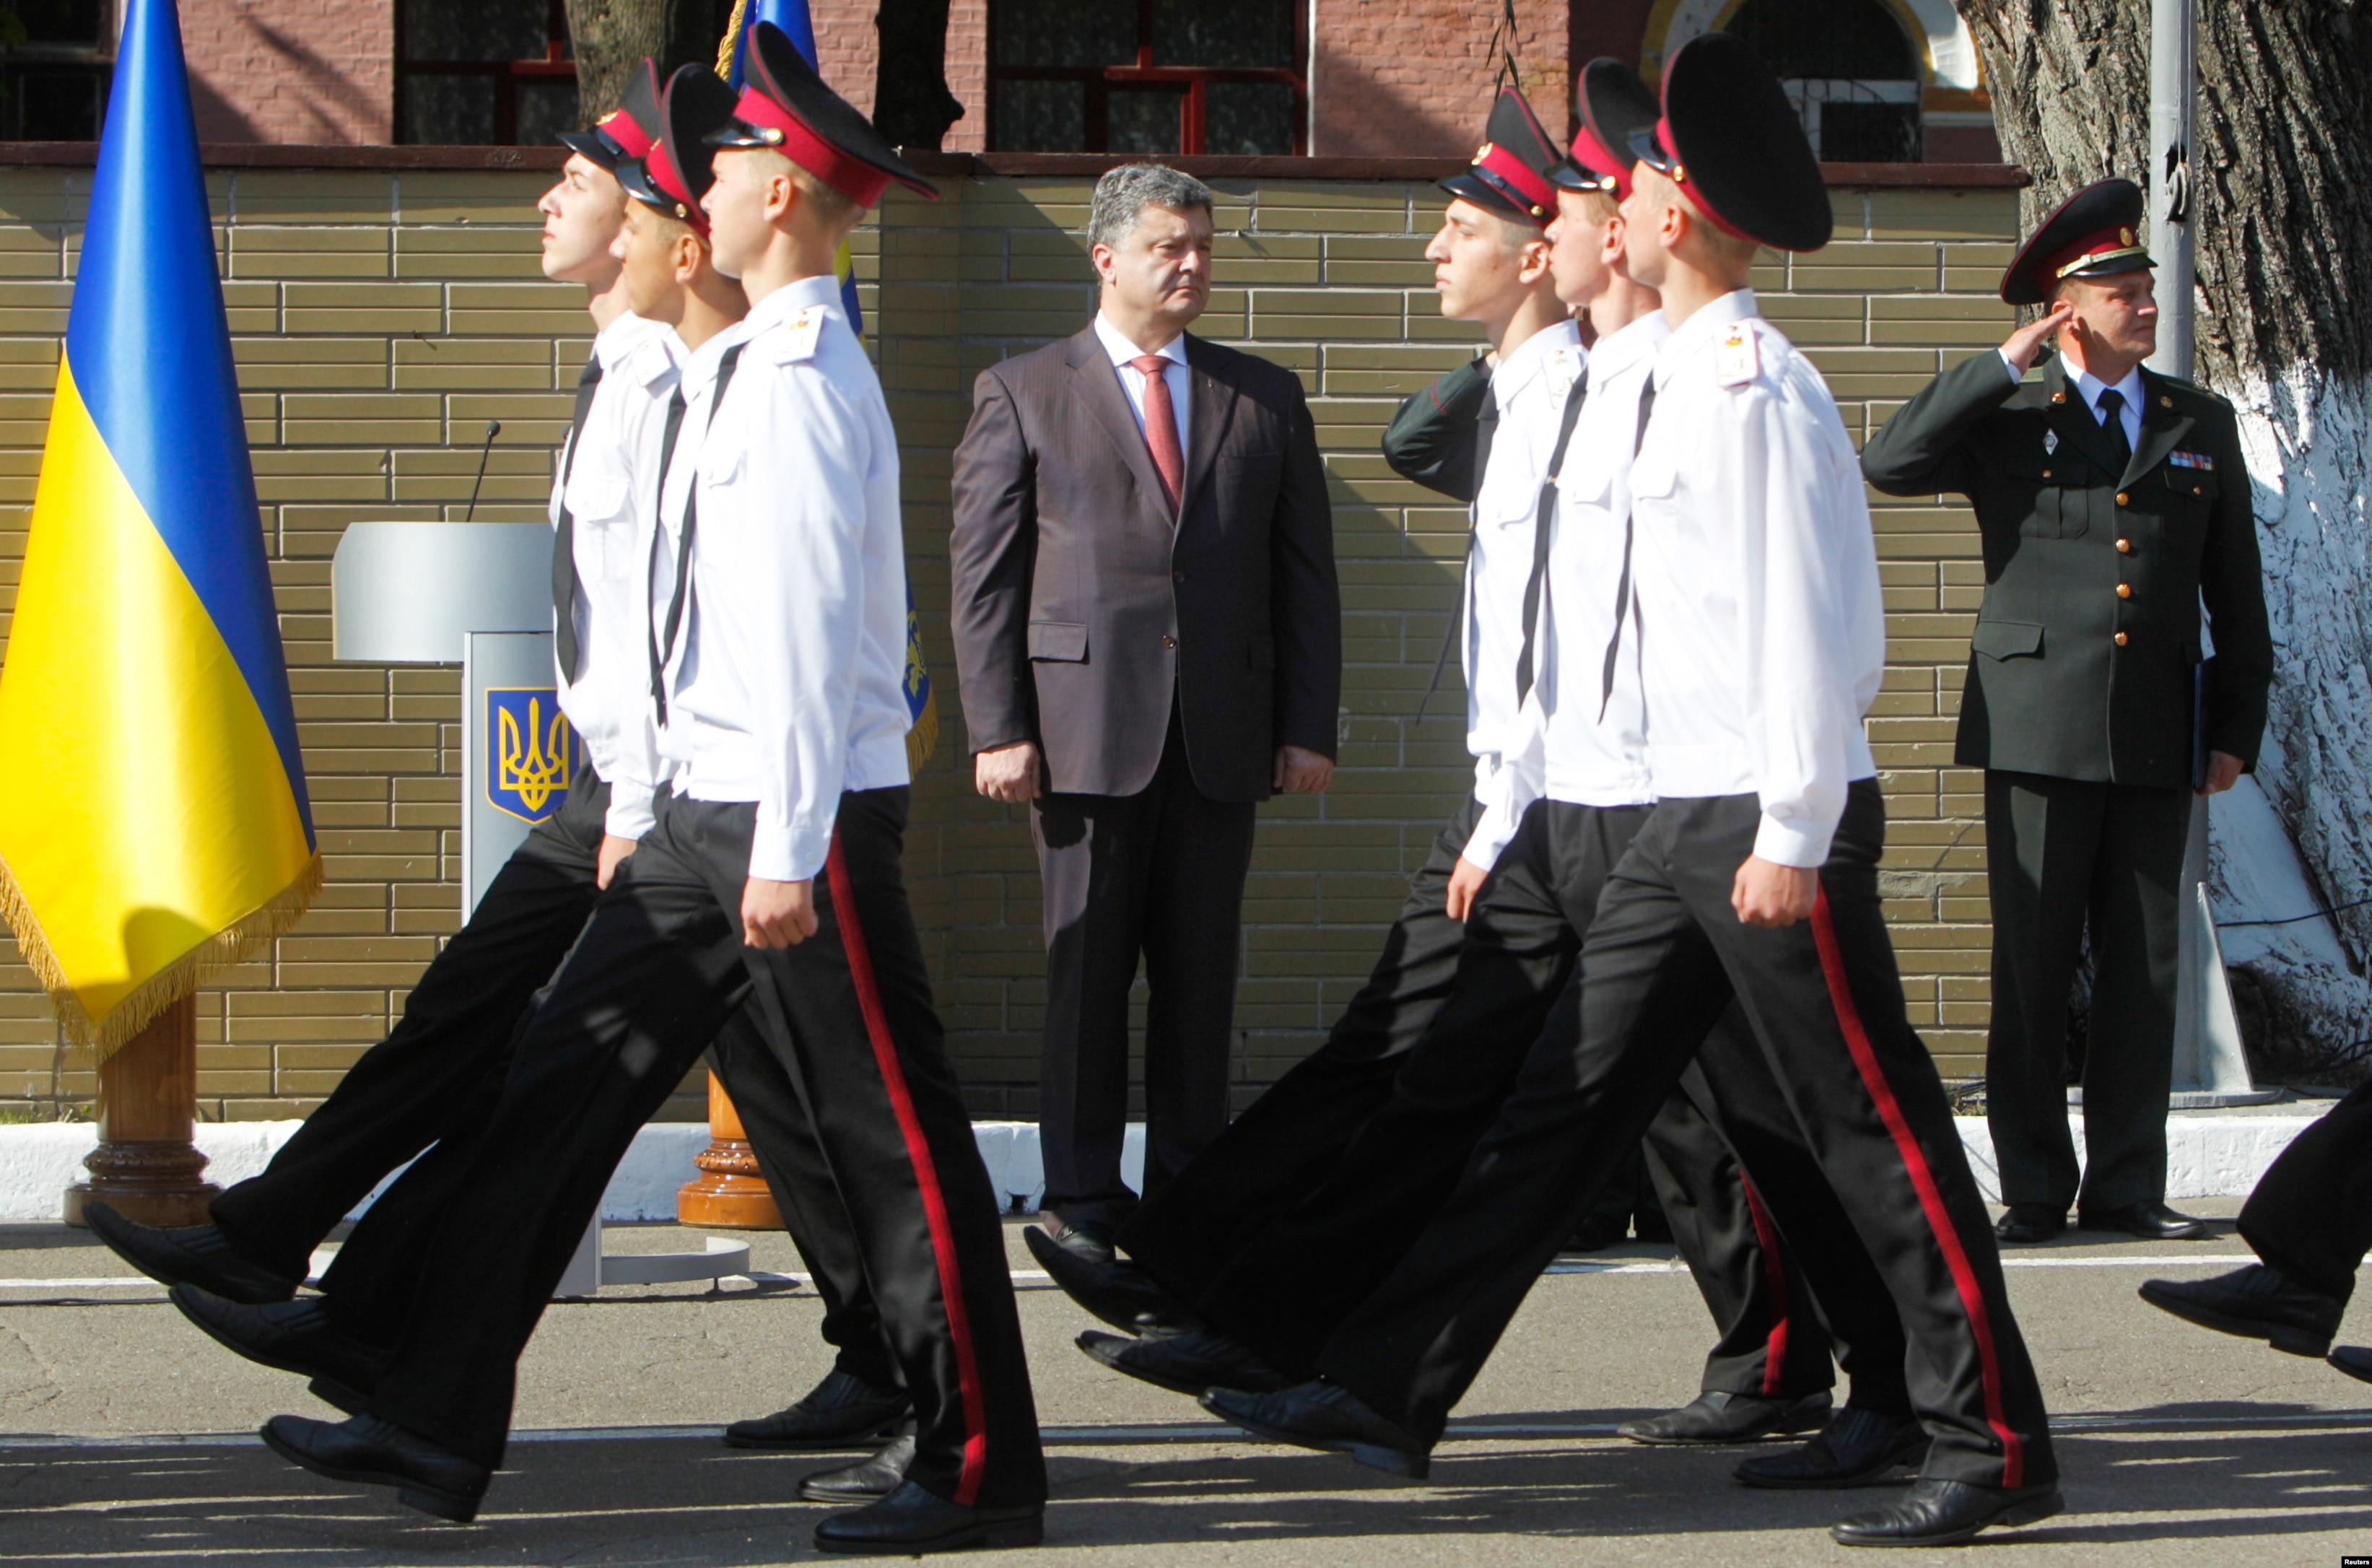 ukraine-s-poroshenko-accuses-russia-of-open-aggression